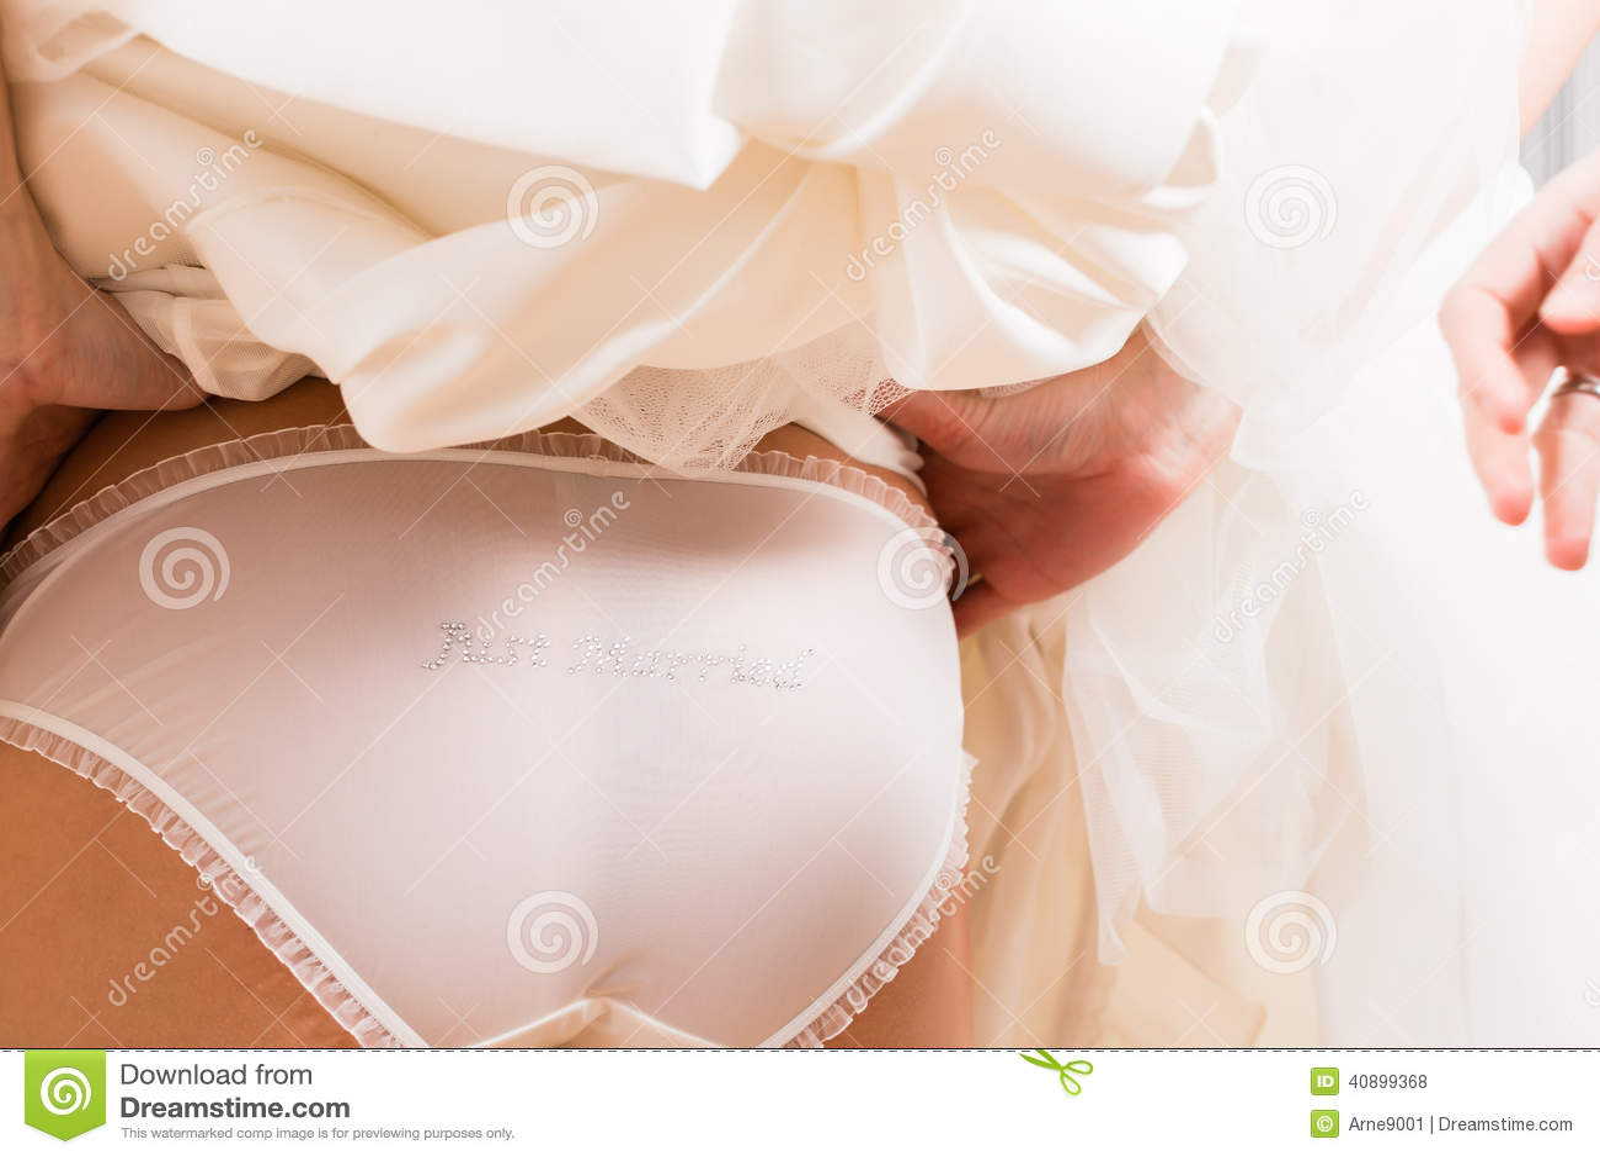 Попа невесты